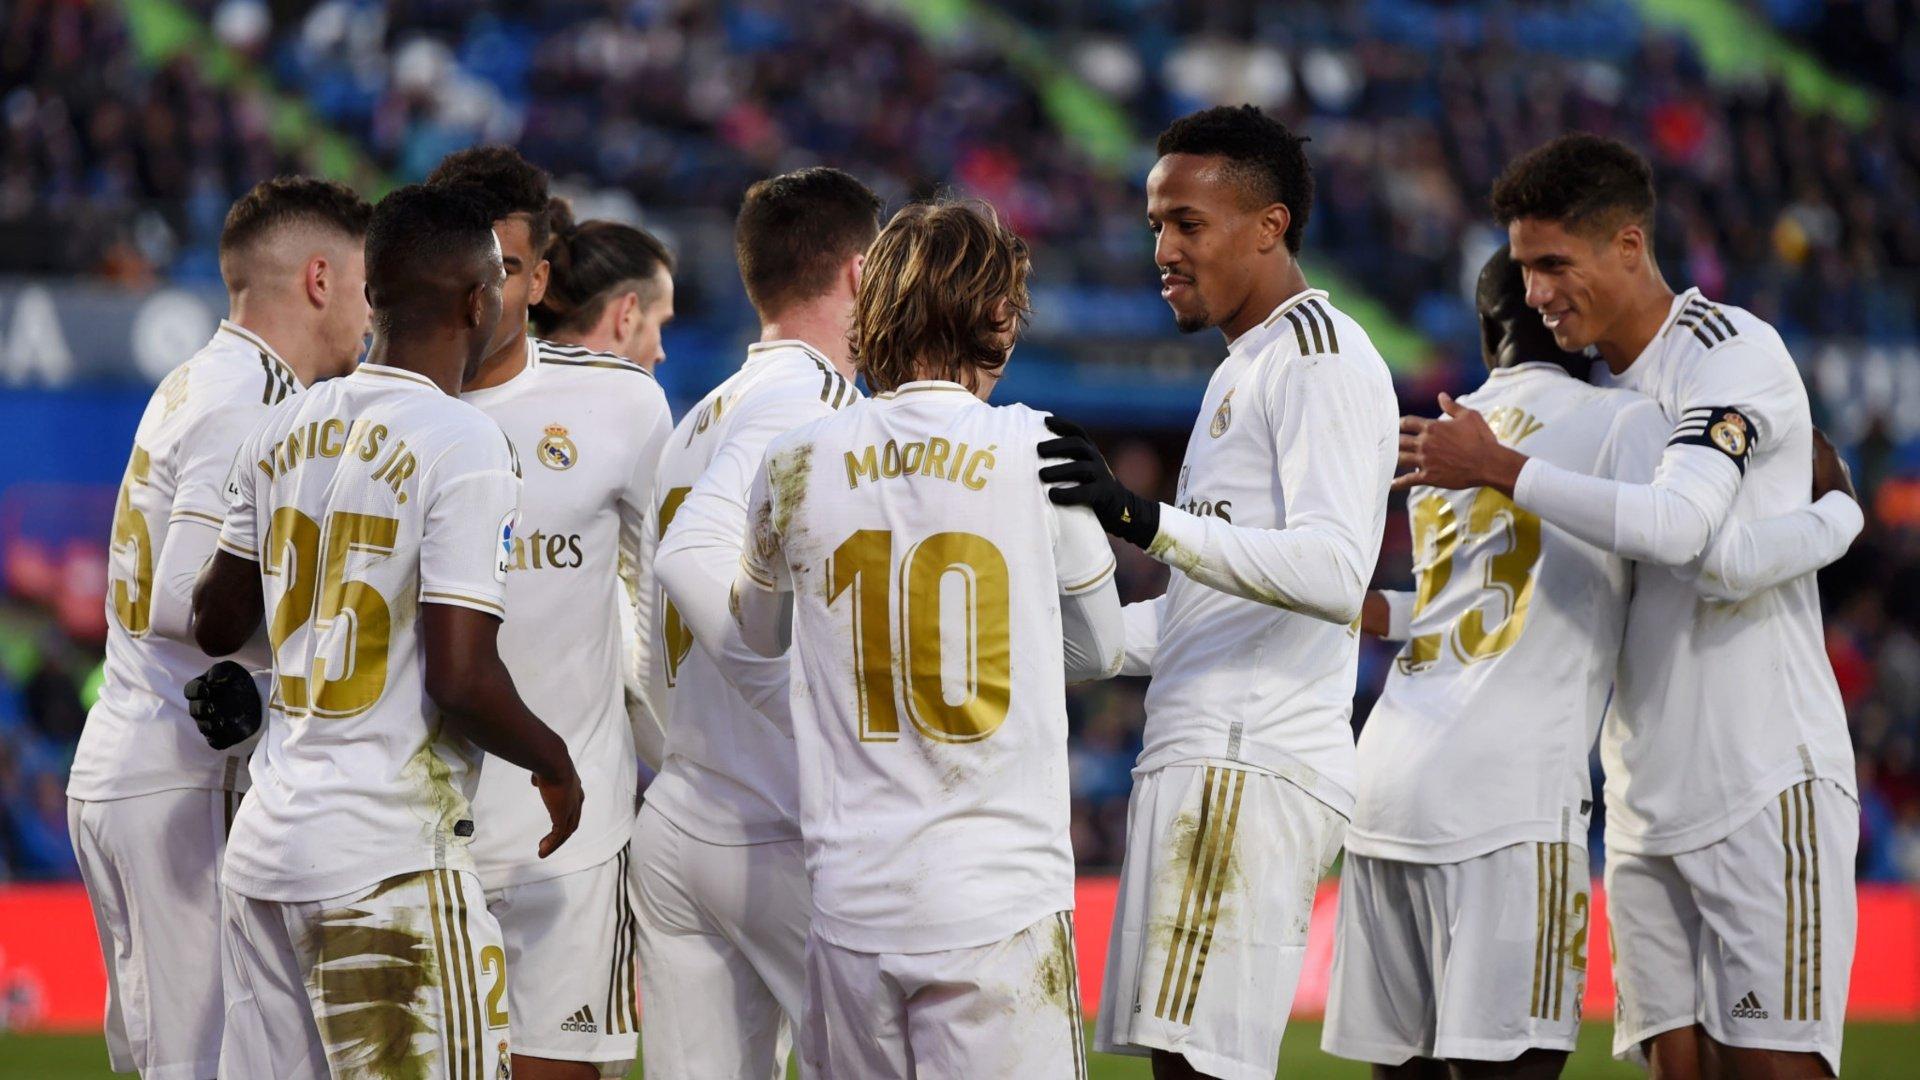 Preview: Valencia vs Real Madrid